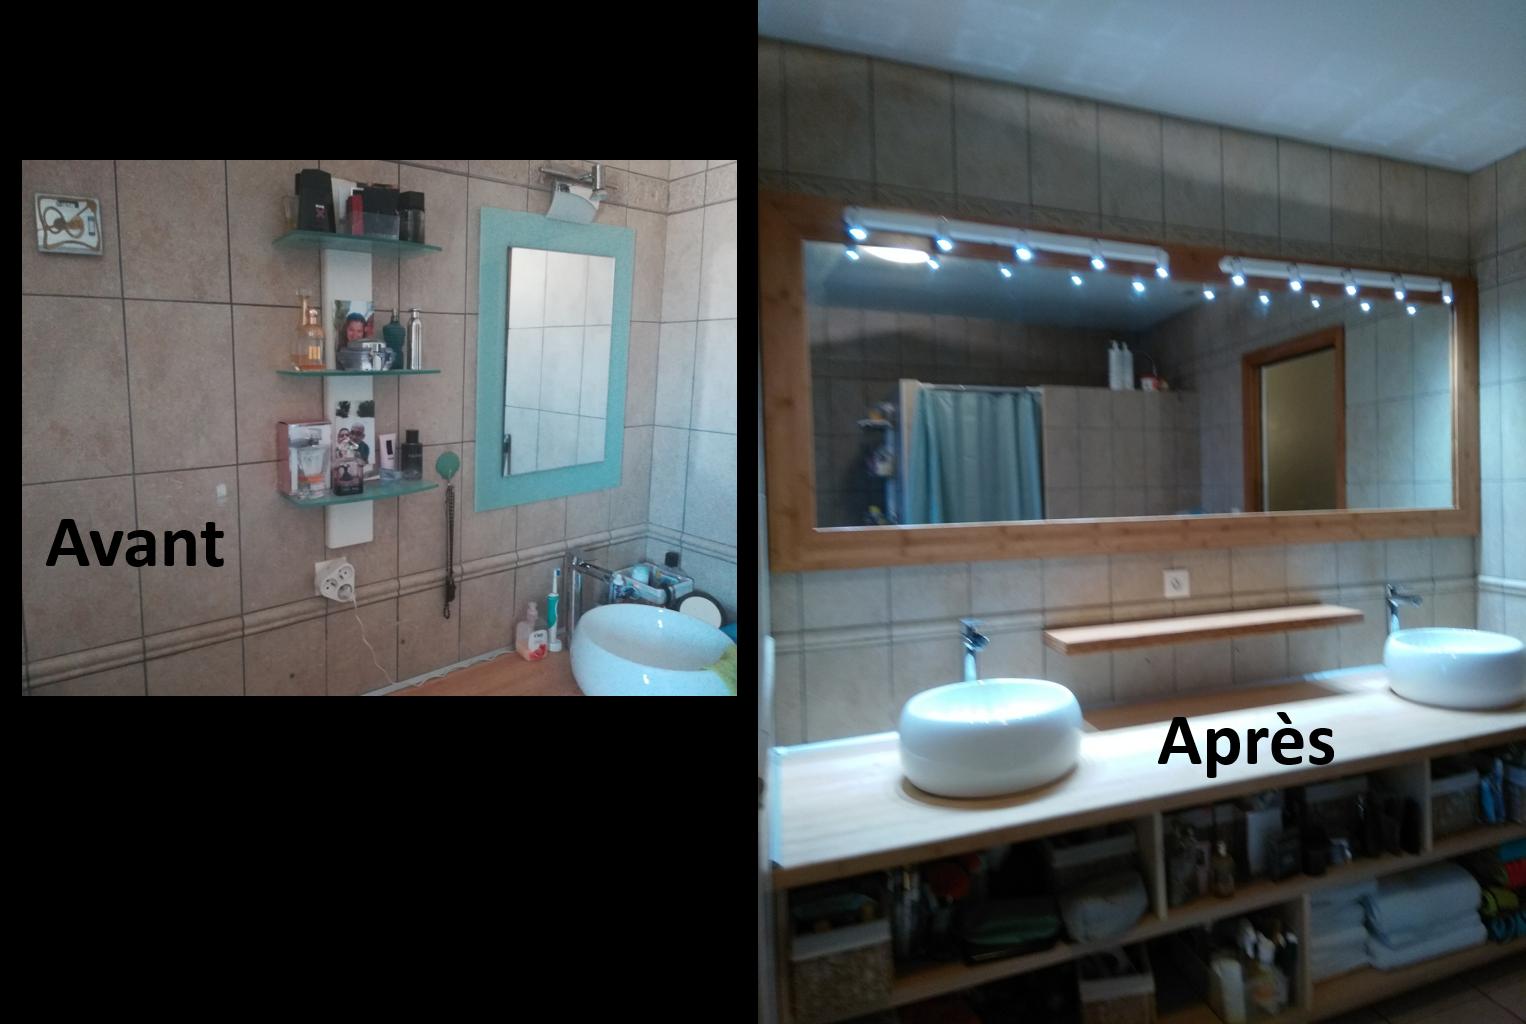 aménagement cuisine, aménagement salle-de-bain, travaux cuisine, travaux salle de bain